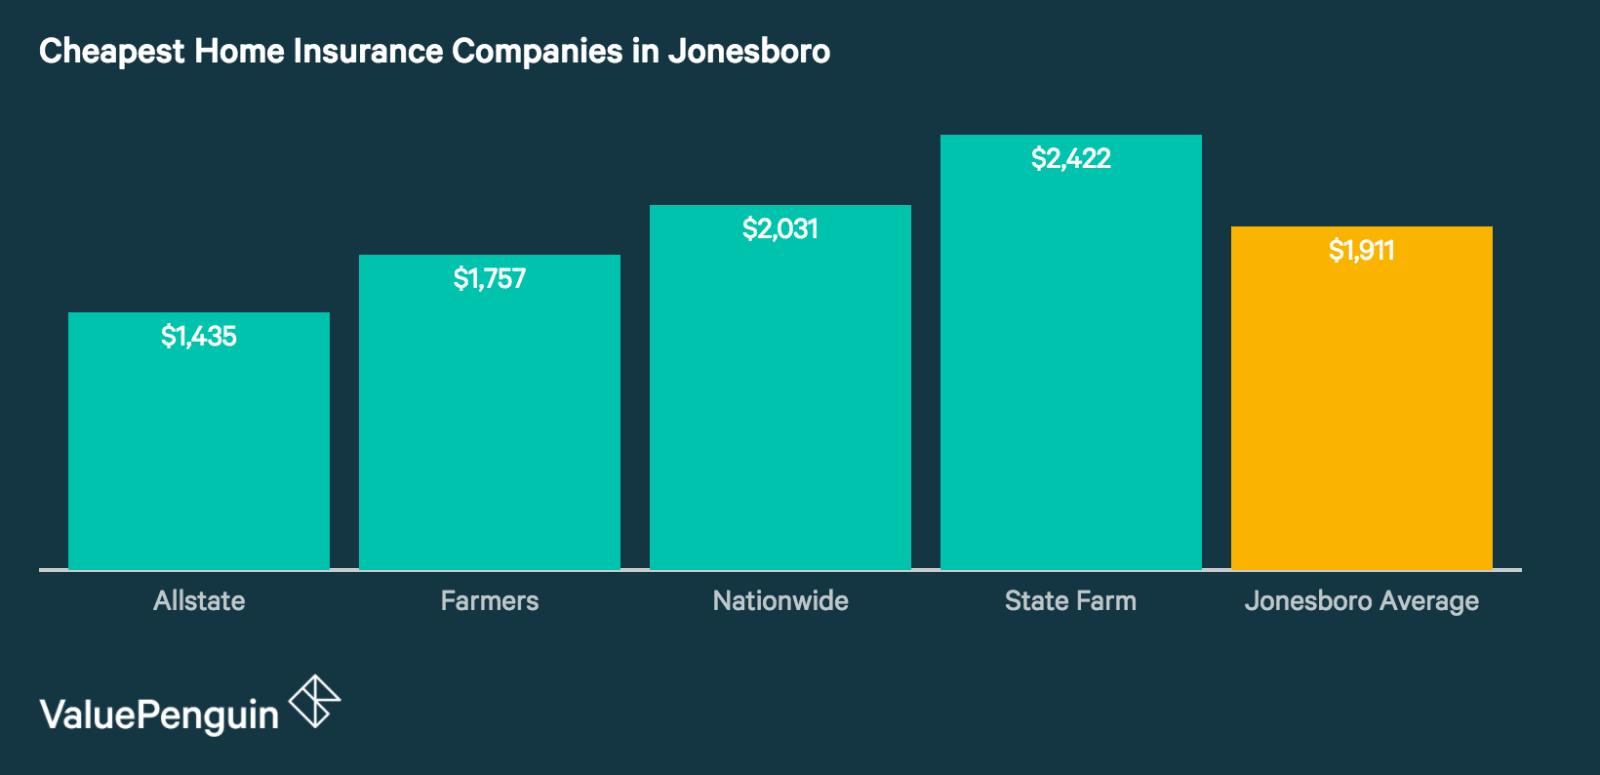 Best Cheap Home Insurance Companies in Jonesboro